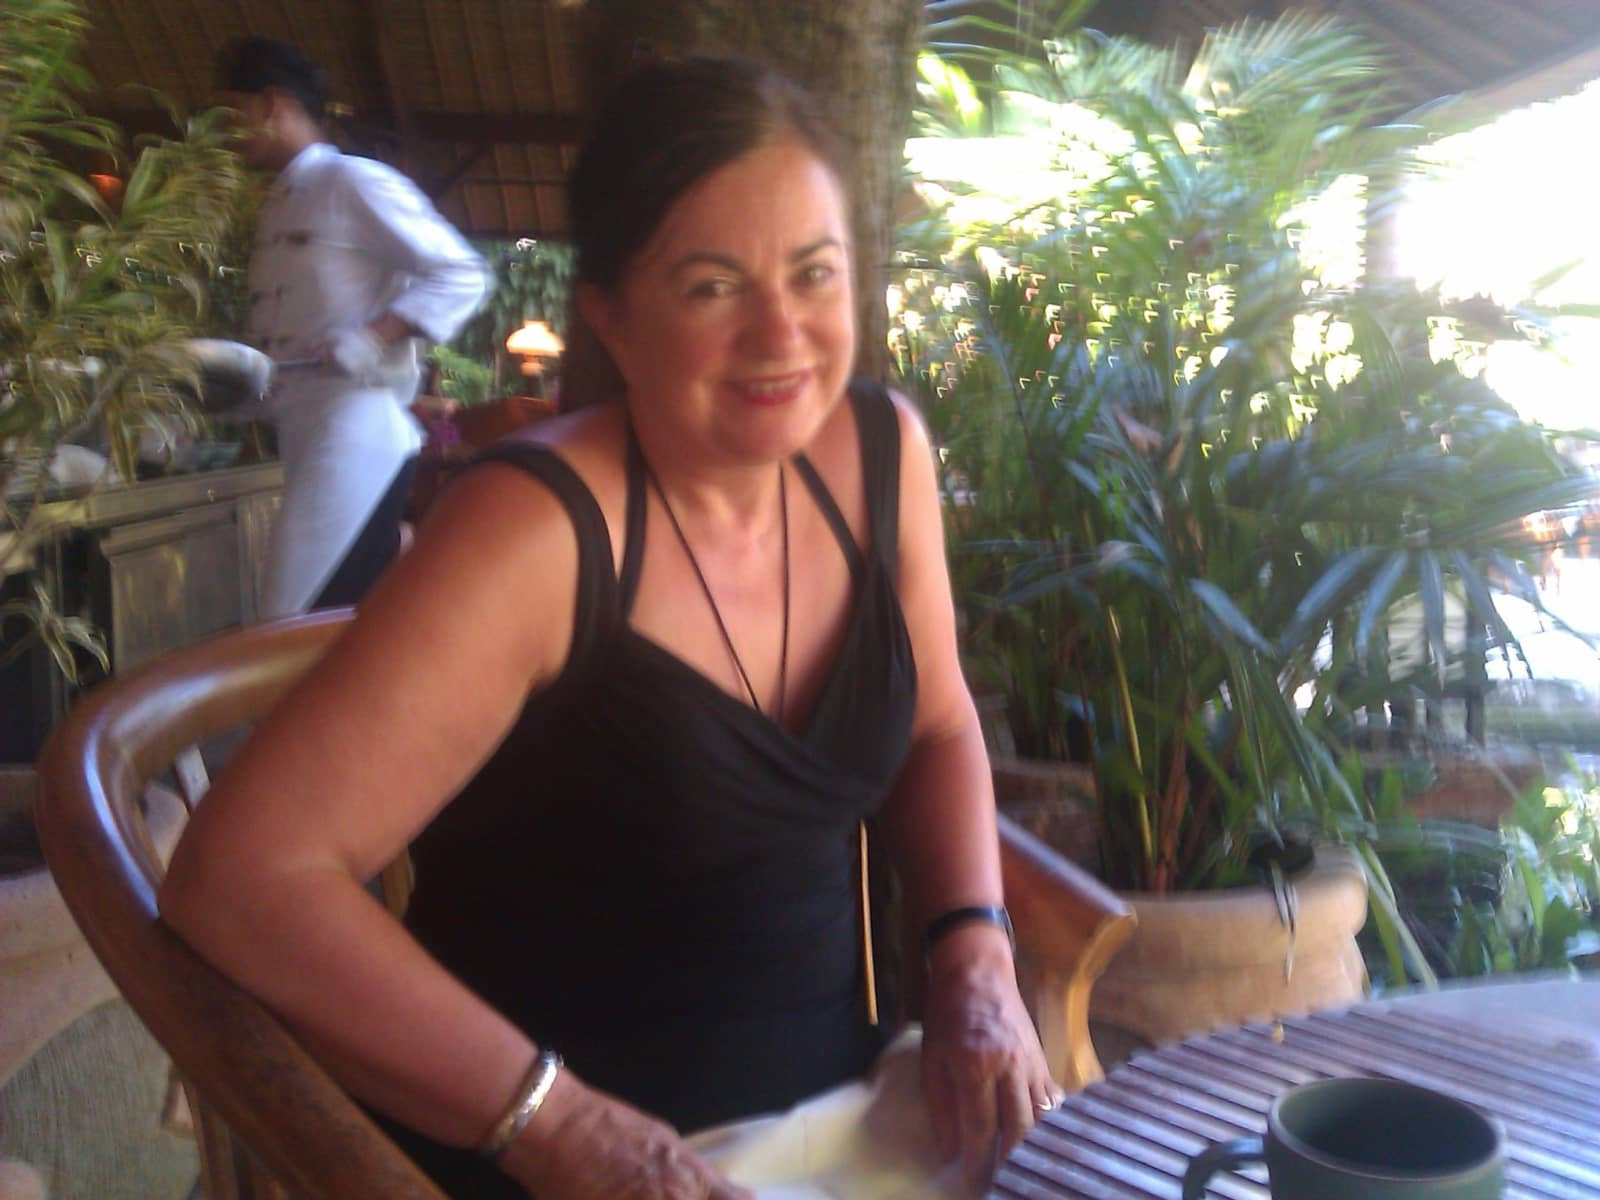 Elizabeth from Darwin, Northern Territory, Australia